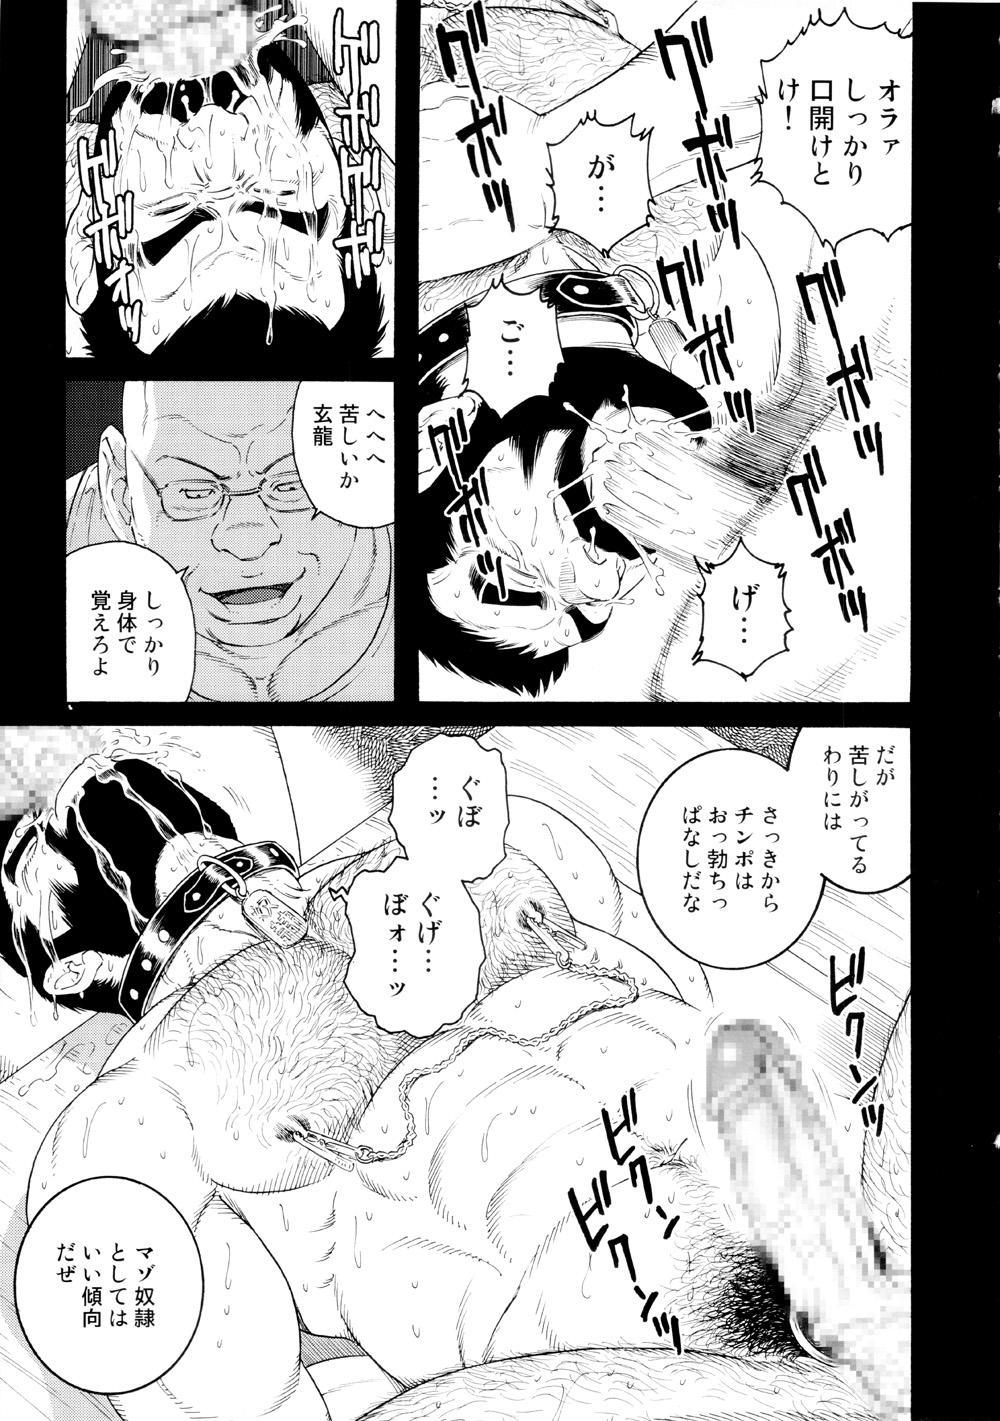 Genryu Chapter 2 4